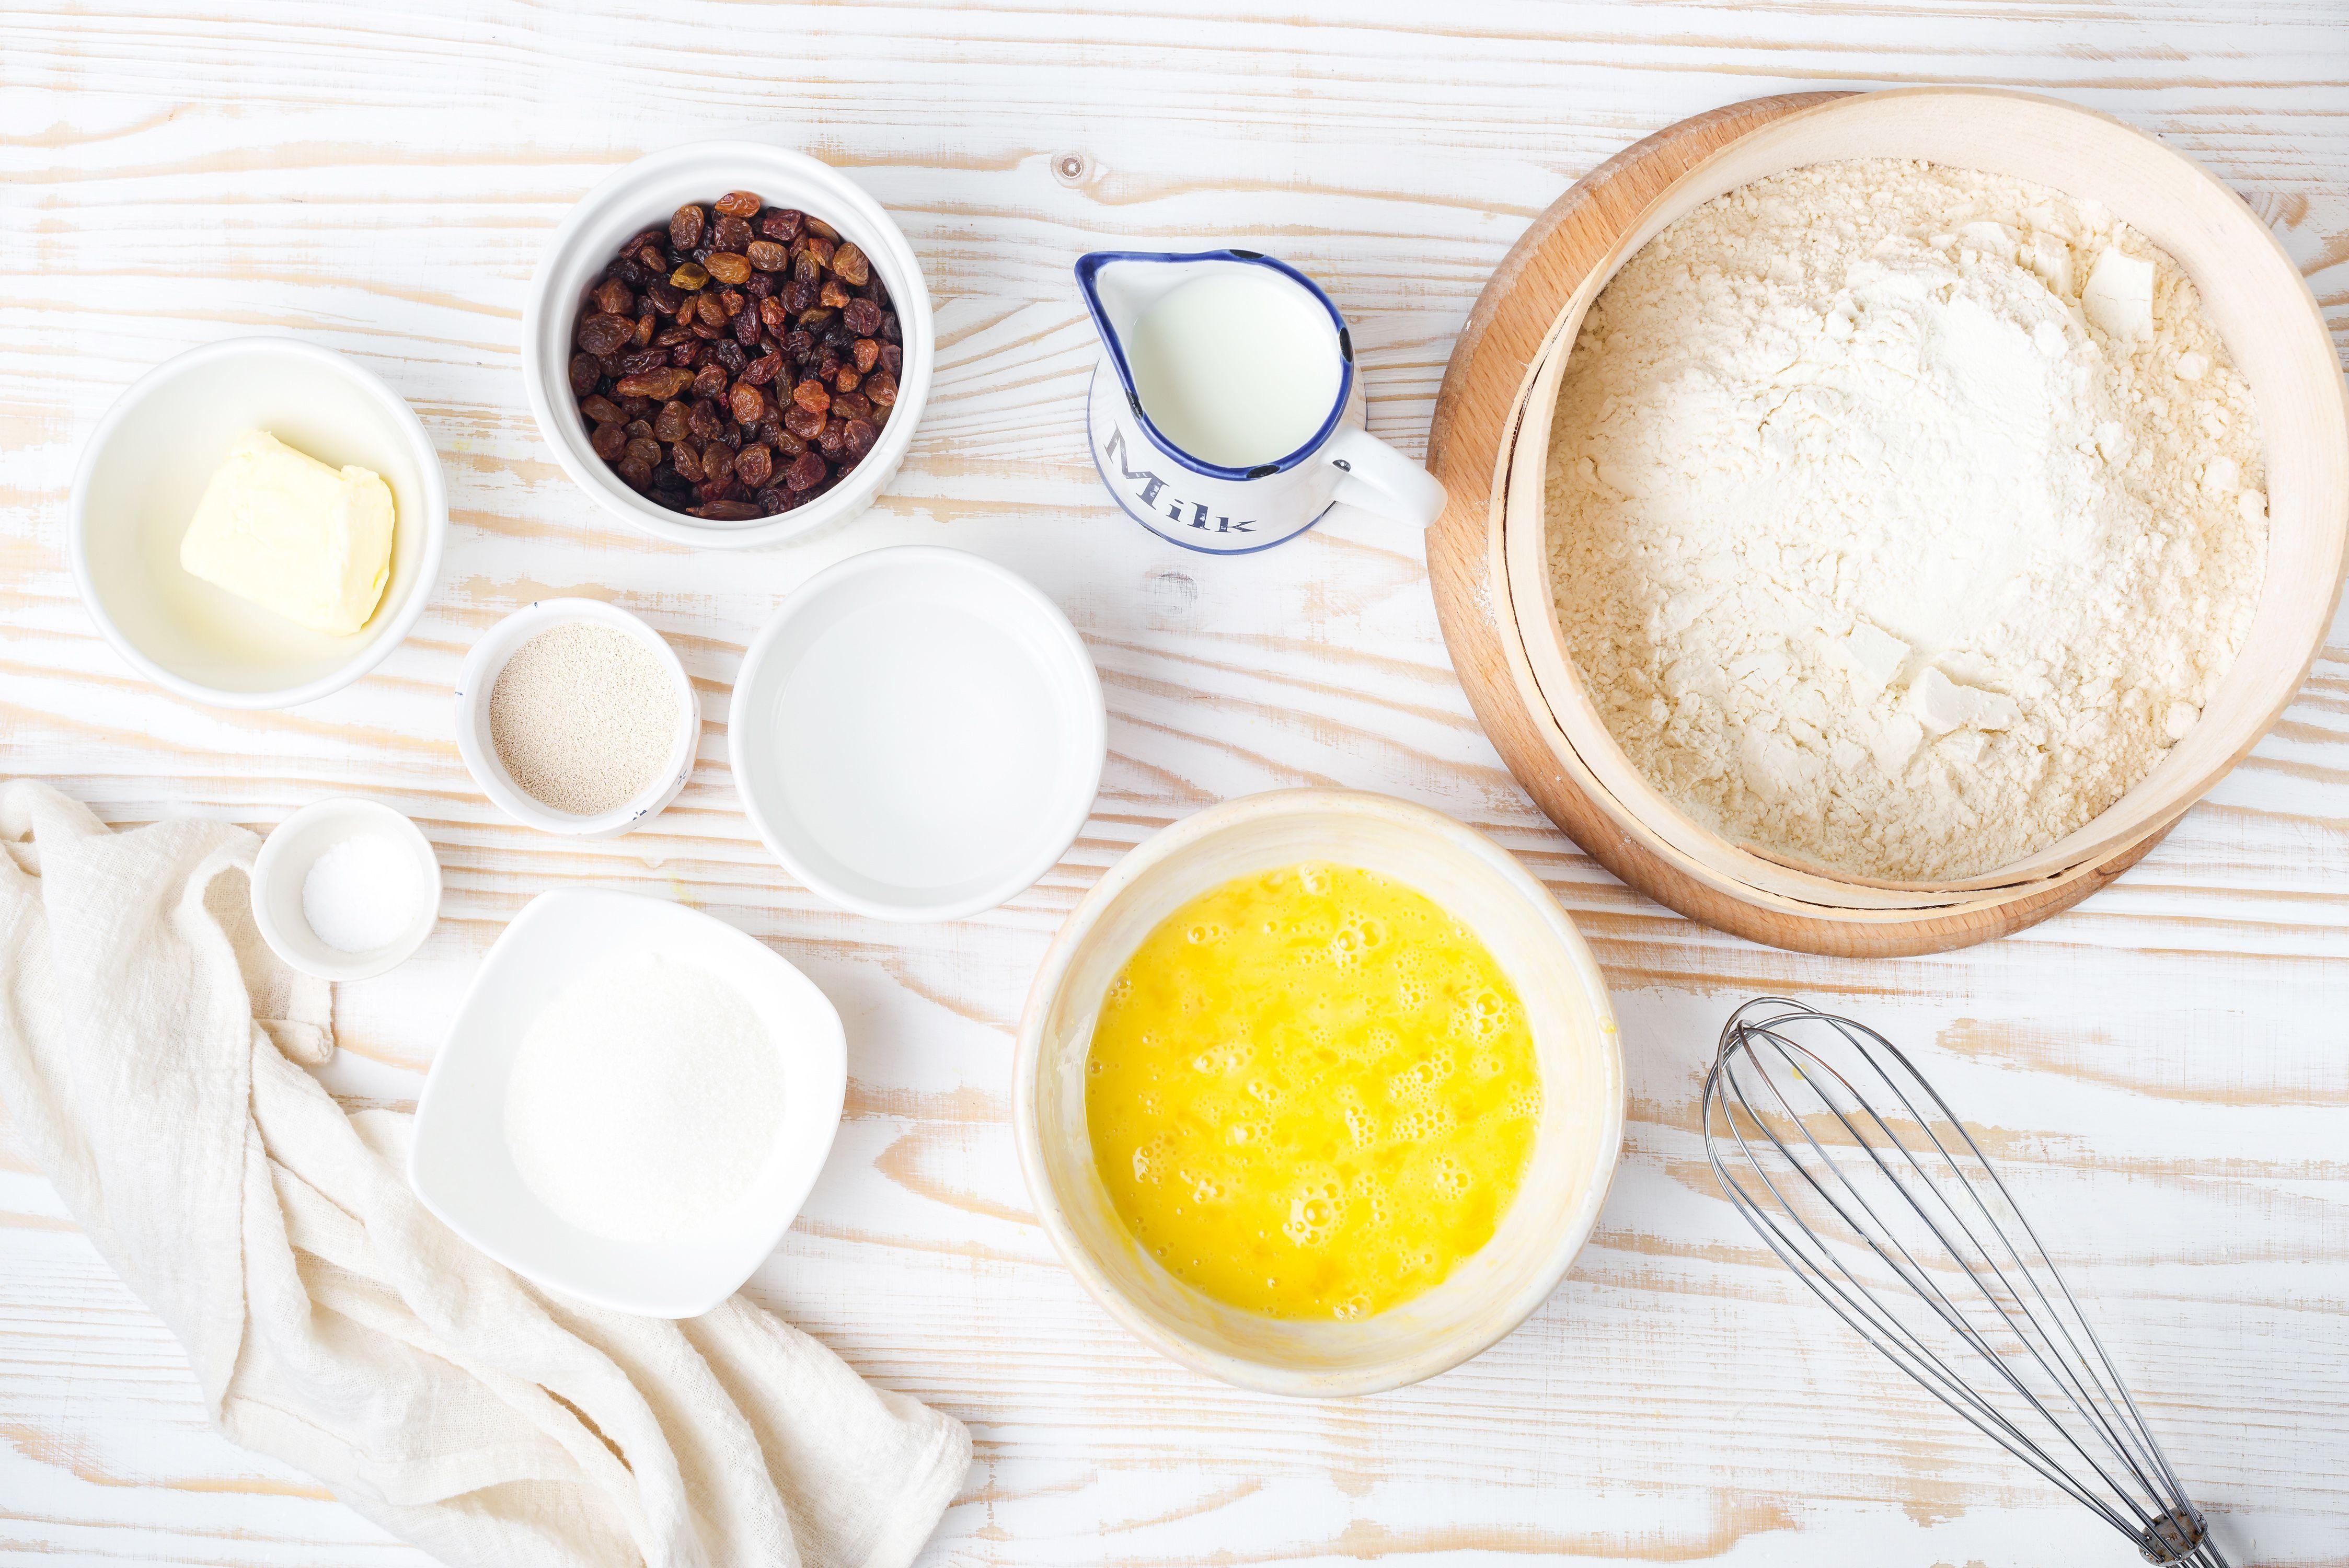 raisin bread ingredients